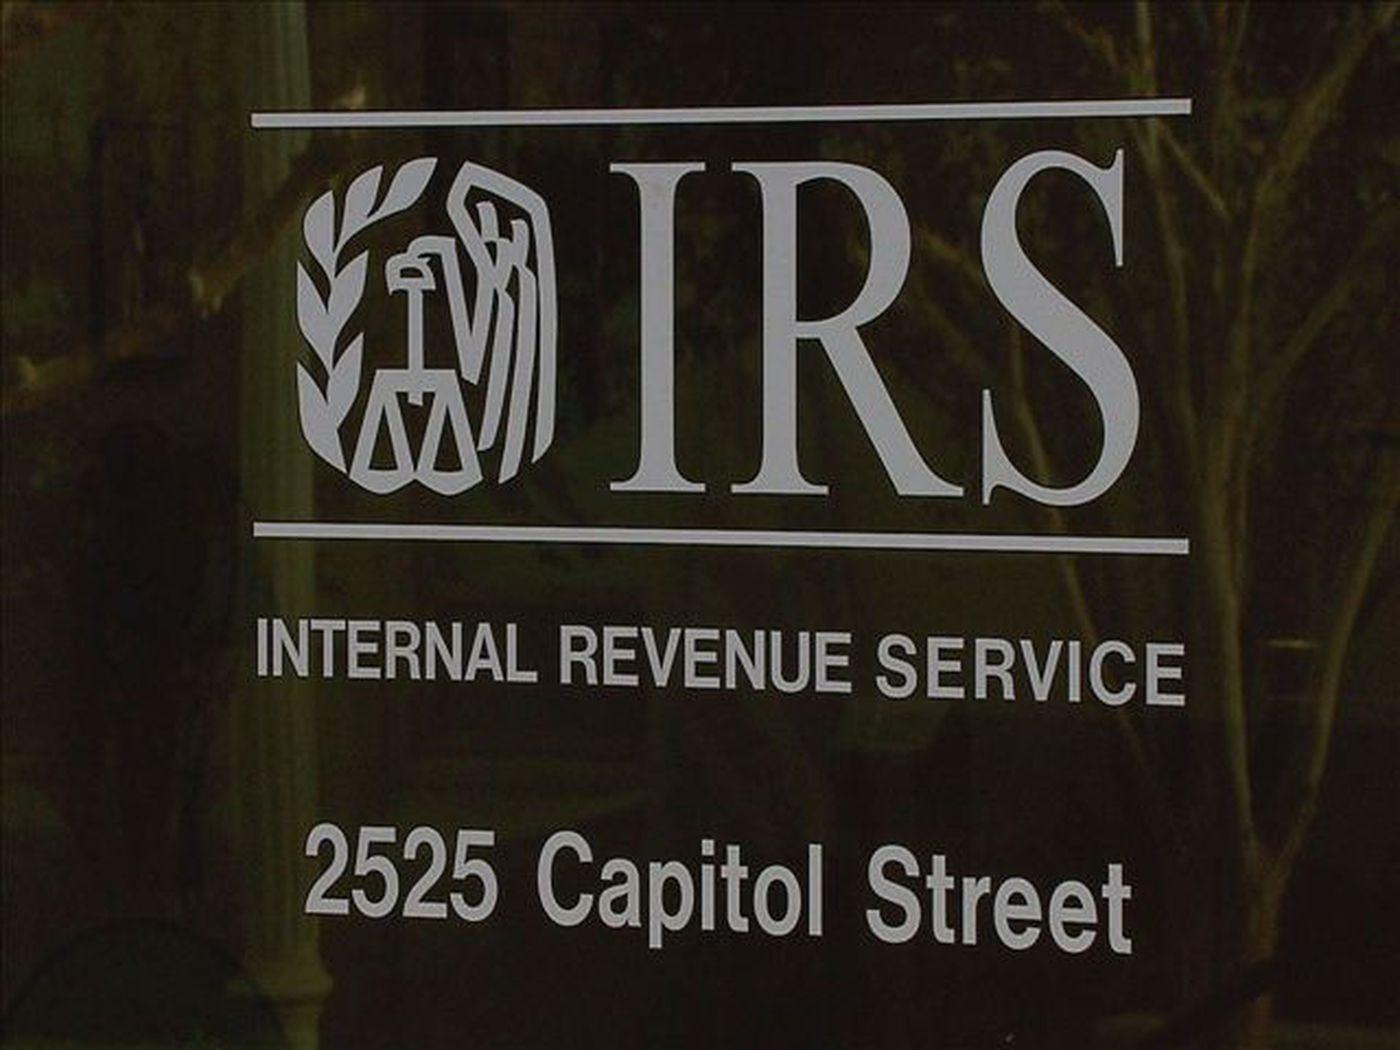 Irs Says 2012 Tax Filing Season Wont Start Until Jan 30